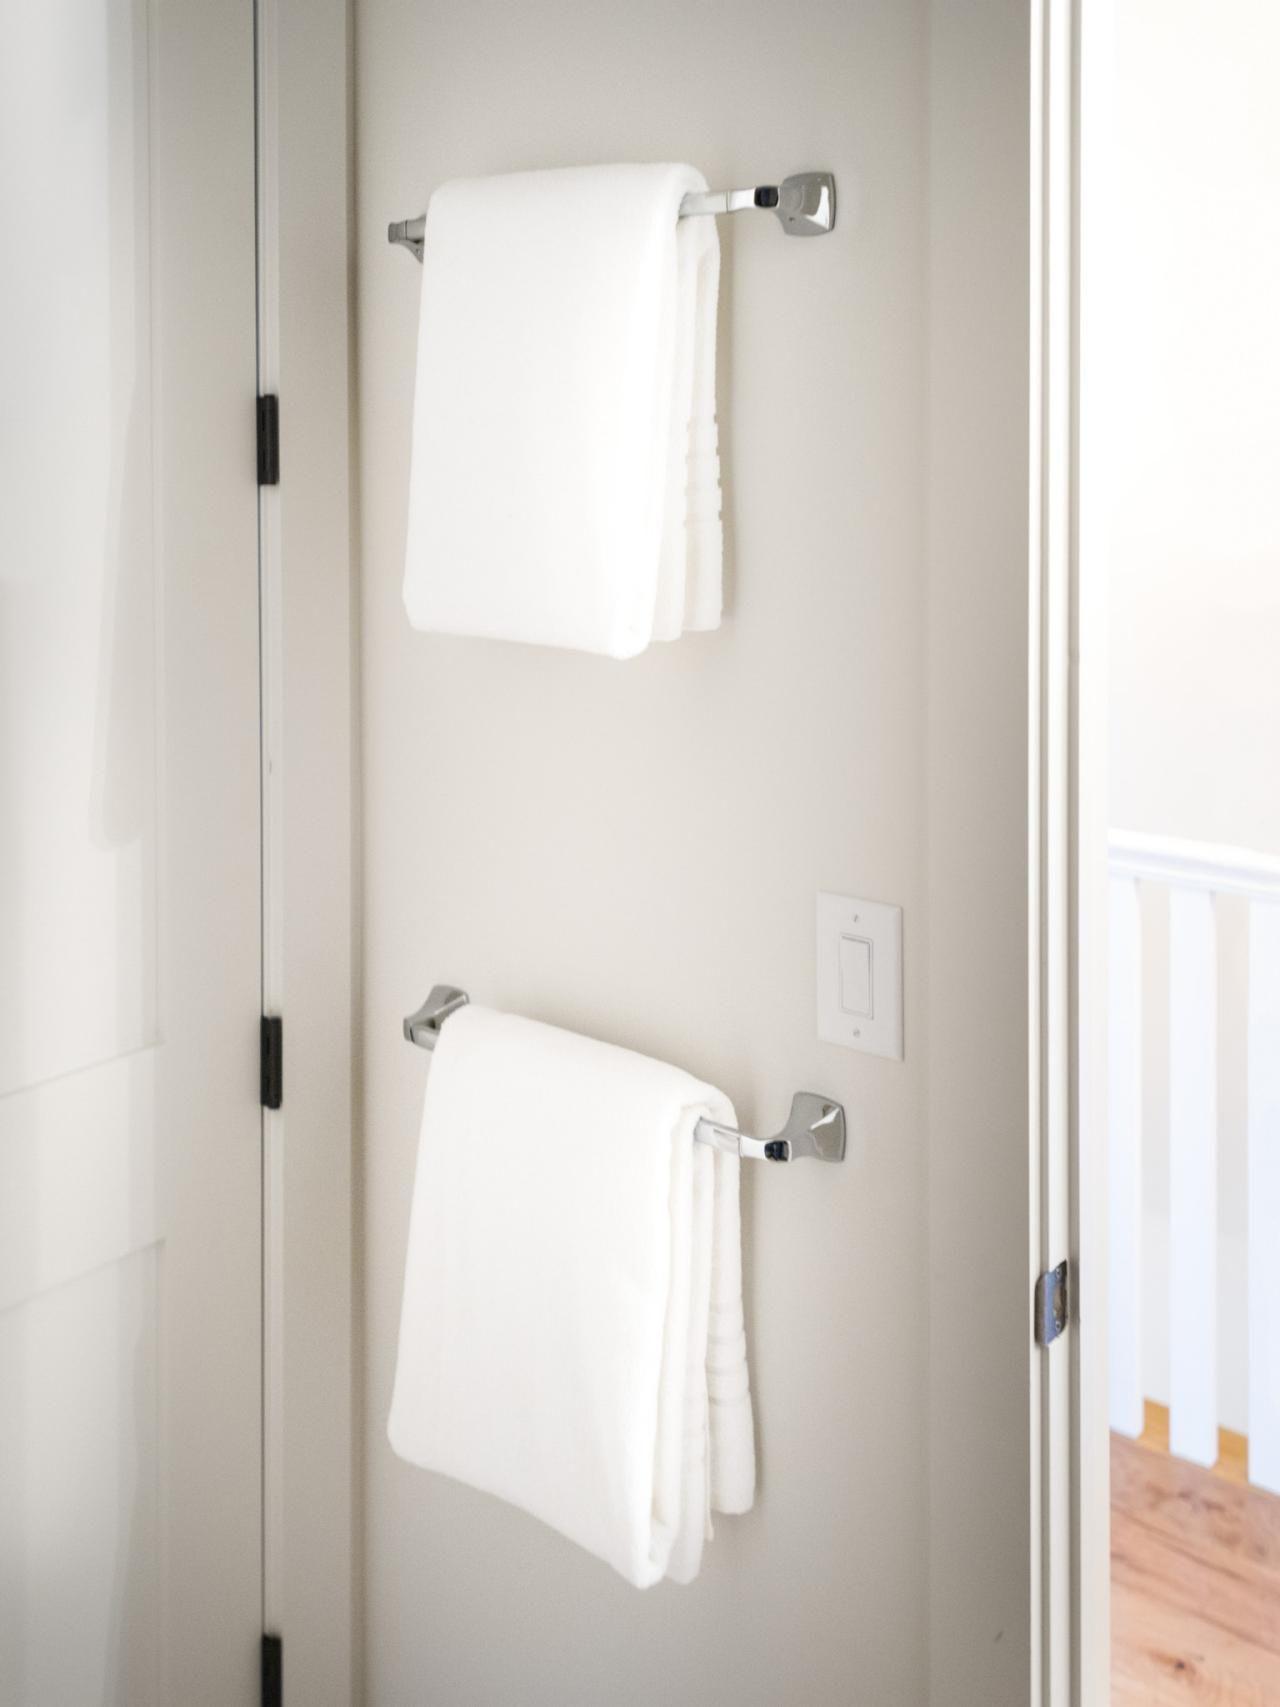 Chrome Towel Racks On Bathroom Door Towel Rack Guest Bathroom Bathroom Pictures